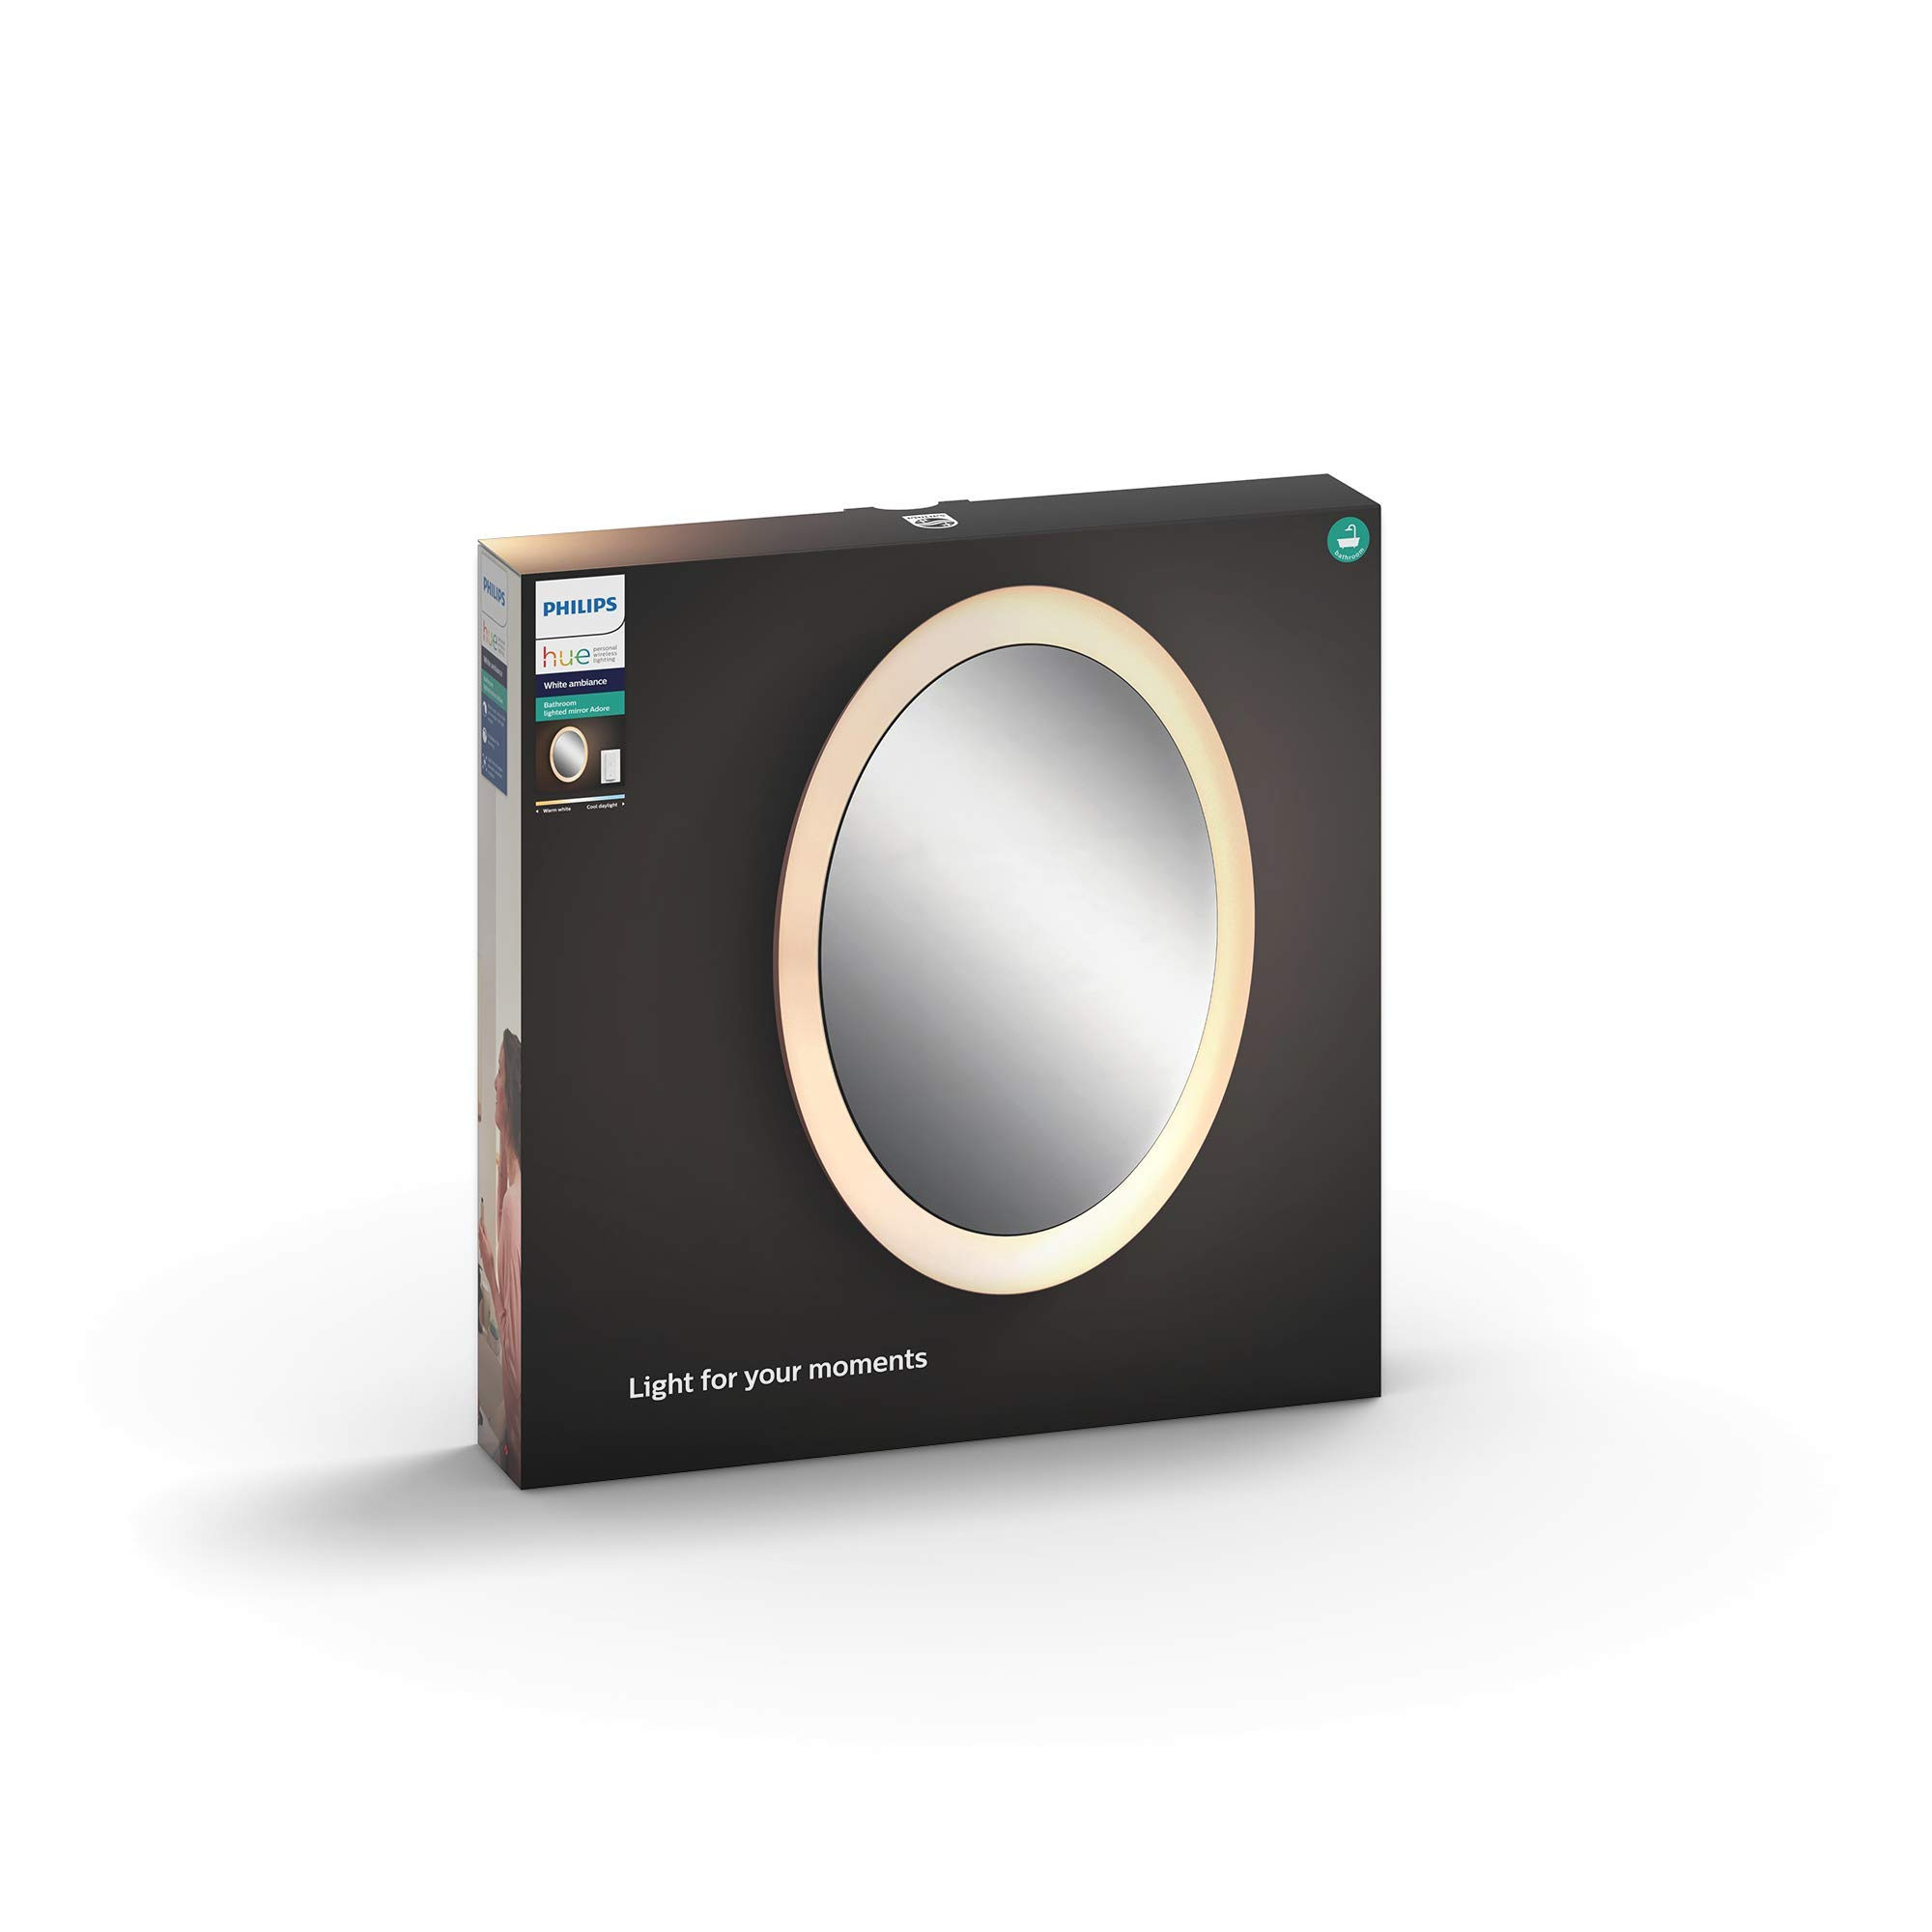 Philips 飞利浦 Hue Adore LED镜面灯,照明灯具,包含 调光开关,所有白色色调,可通过应用程序控制,可兼容Amazon Alexa(Echo/Echo Dot)智能语音助手程序,白色